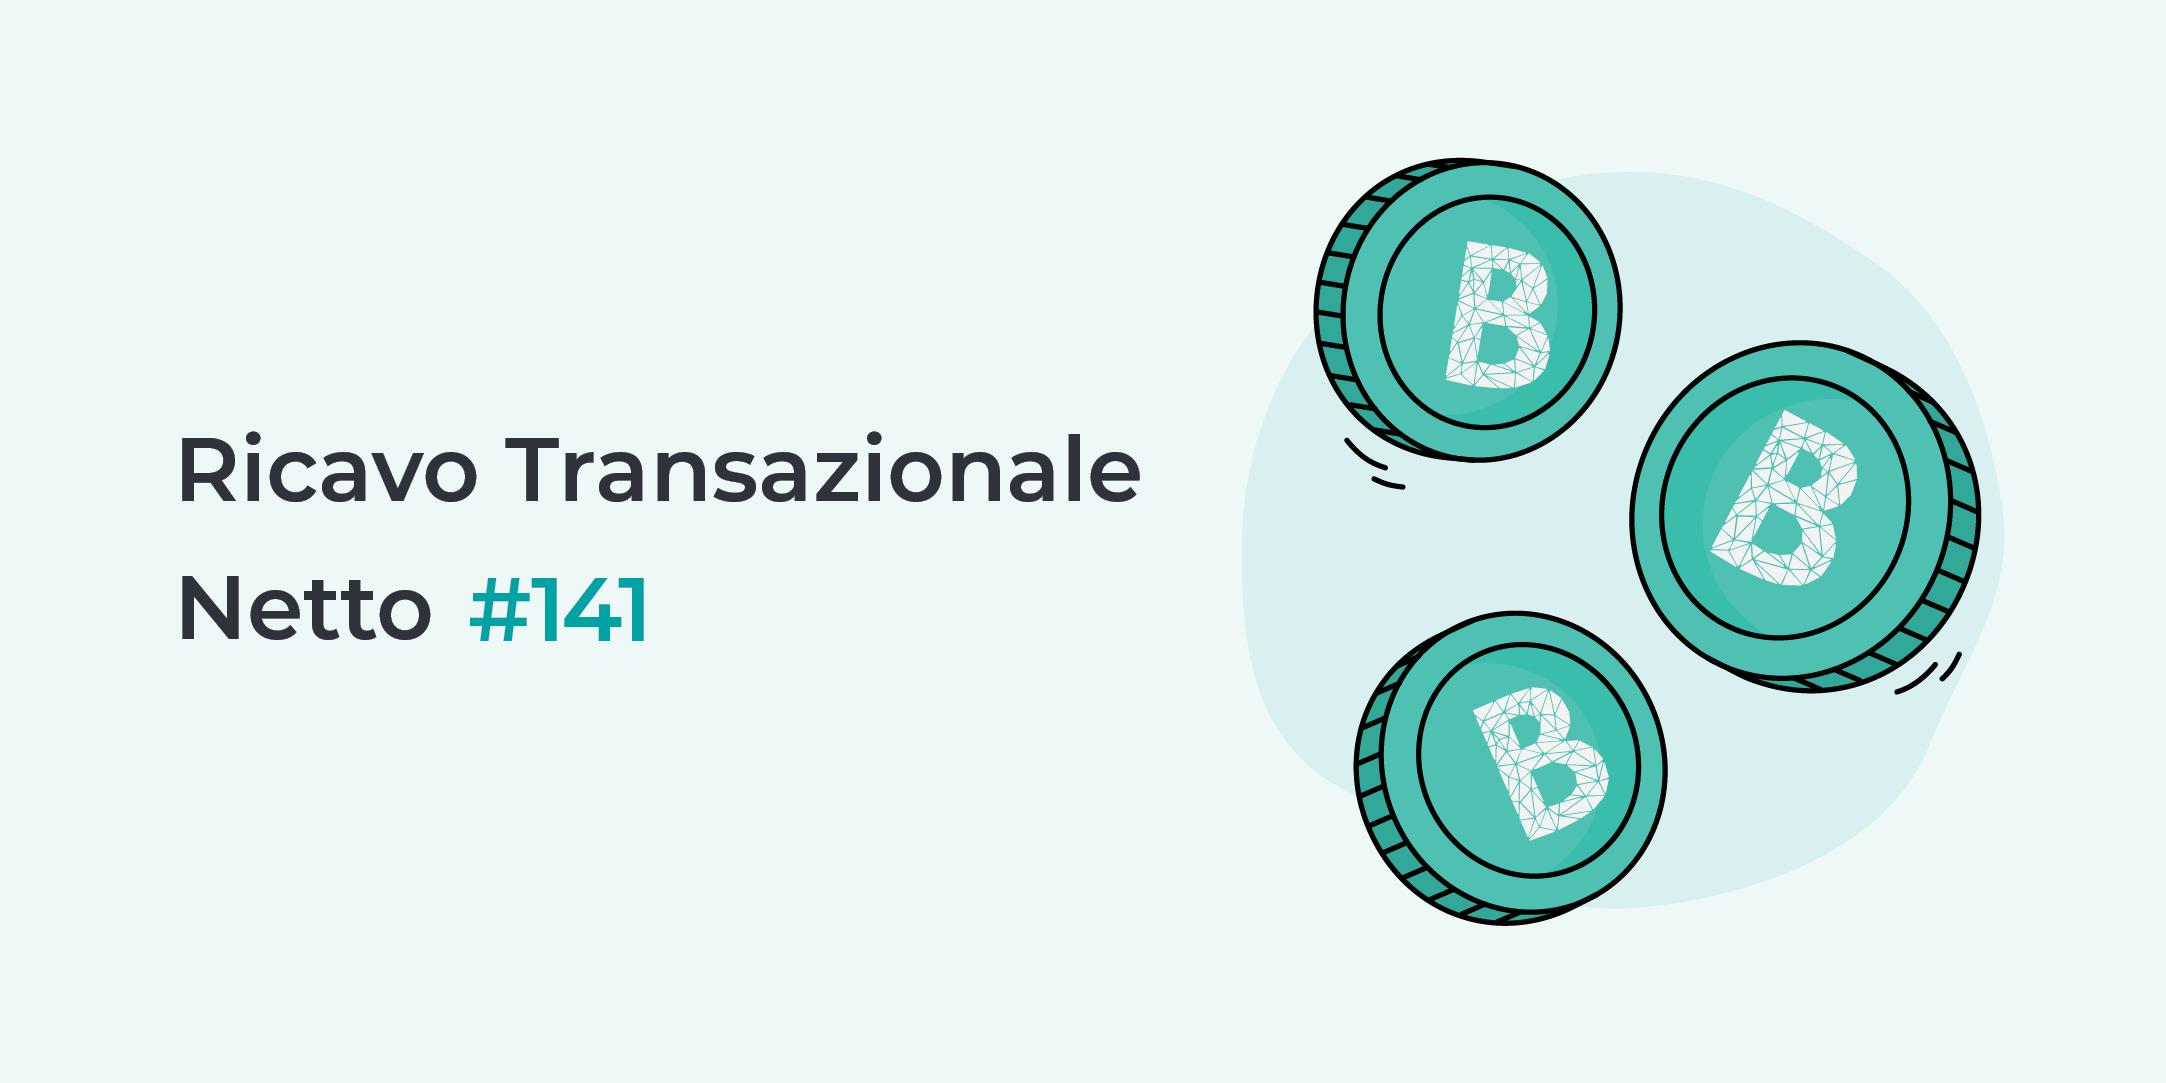 Net Transactional Revenue Number 141